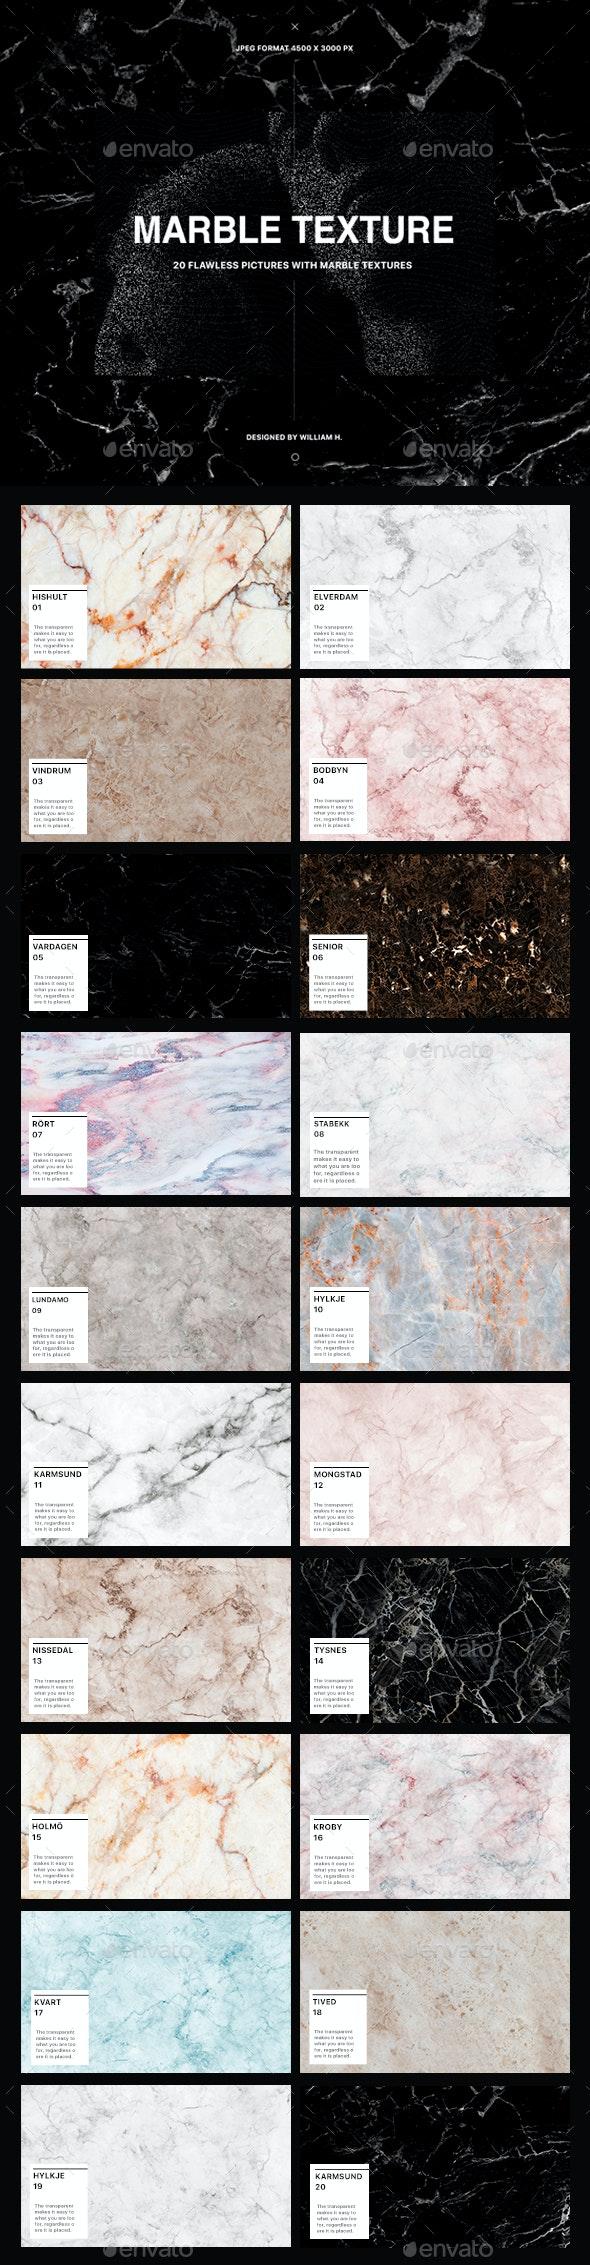 20 Marble Textures - Stone Textures